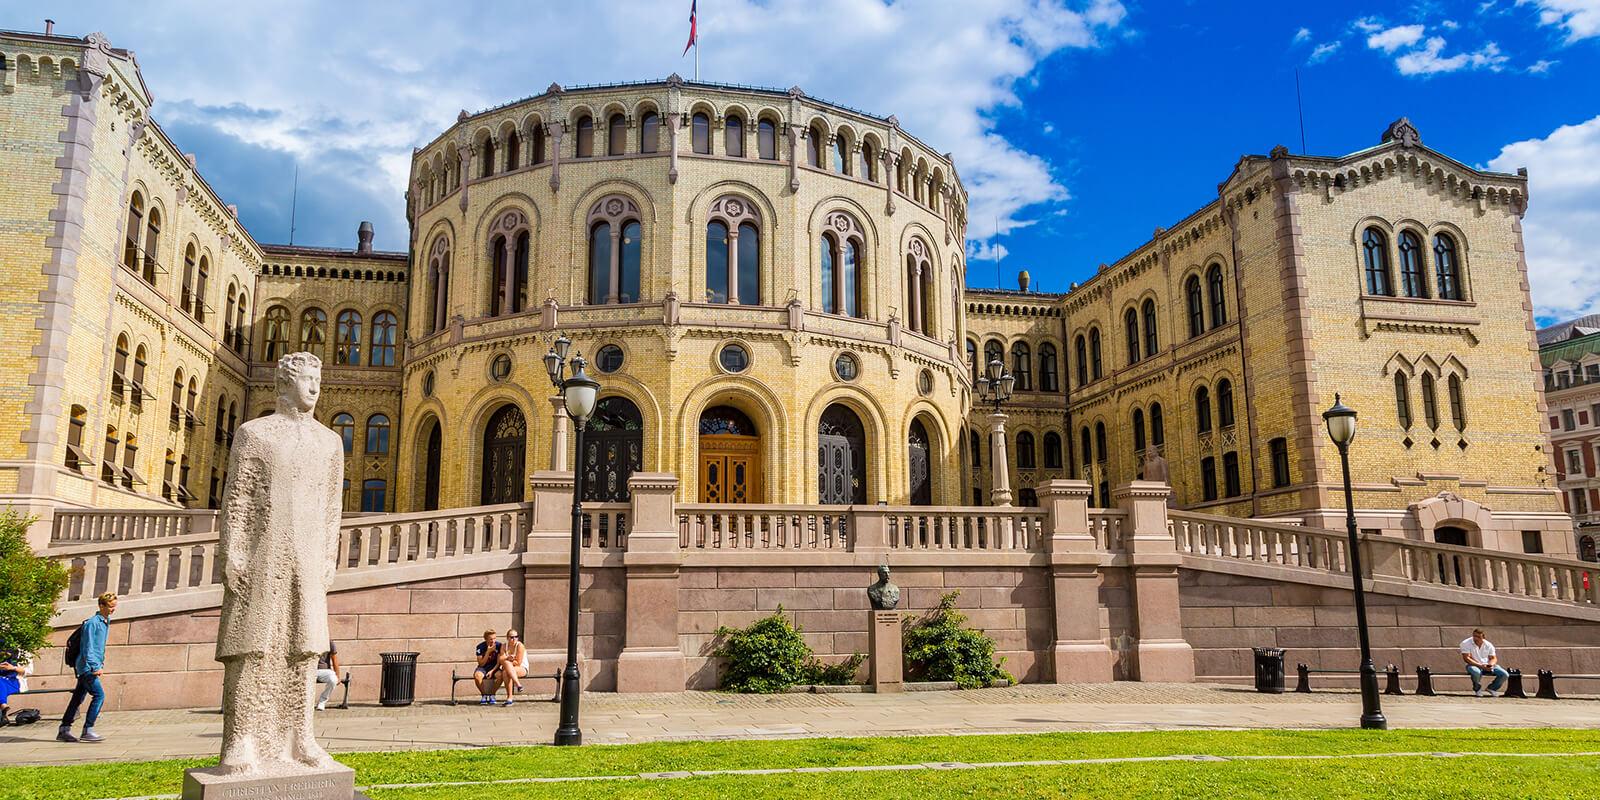 The Norwegian Parliament